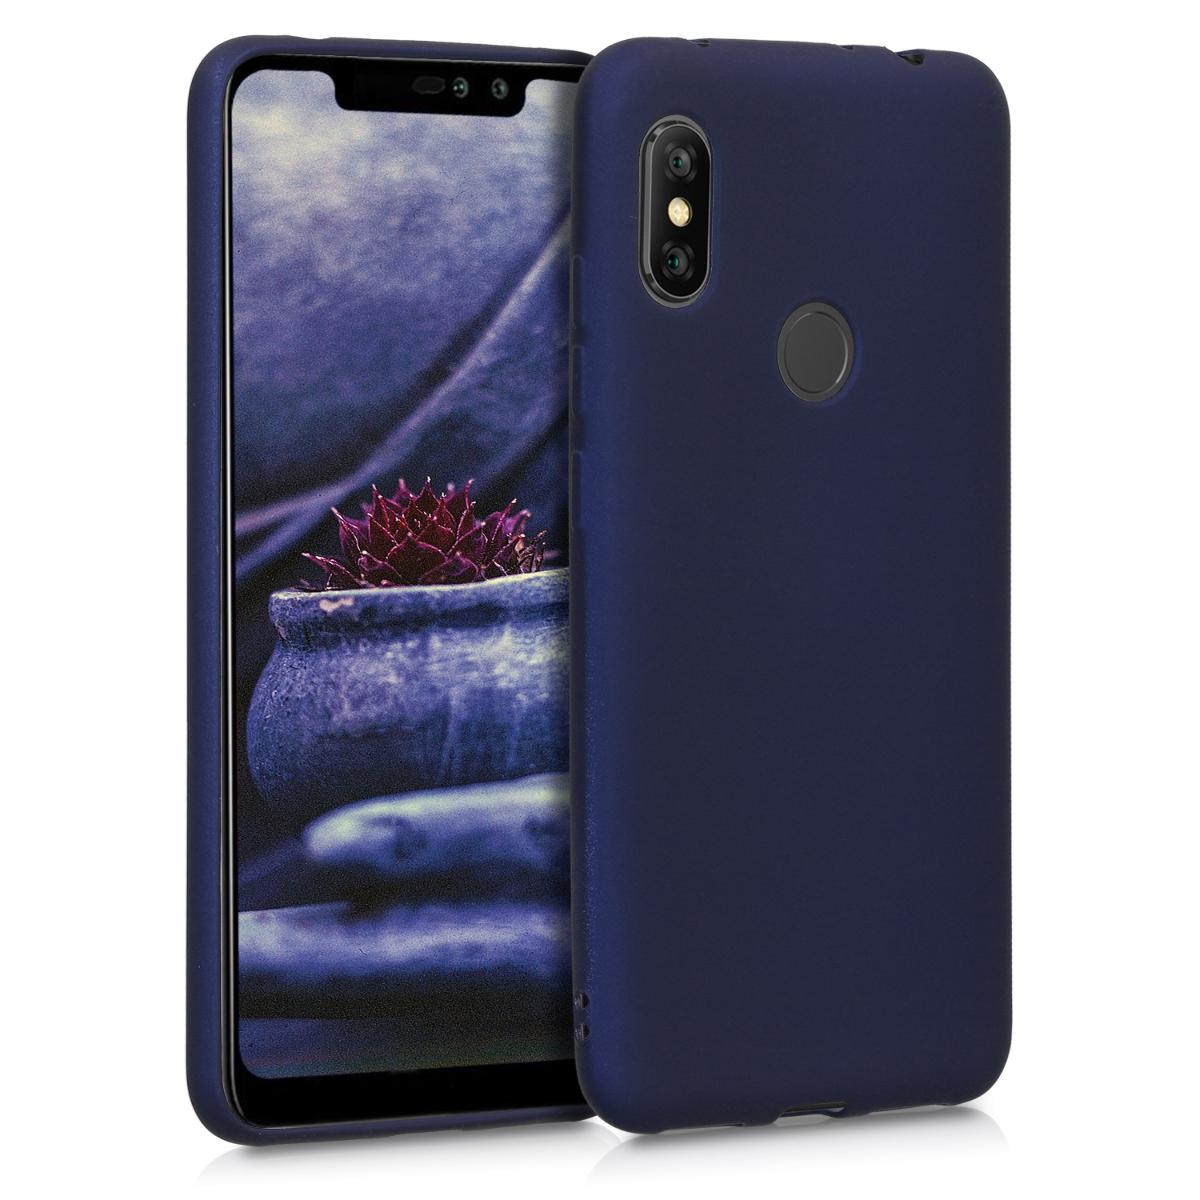 KW Θήκη Σιλικόνης  Xiaomi Redmi Note 6 Pro - Metallic Blue (46508.64)